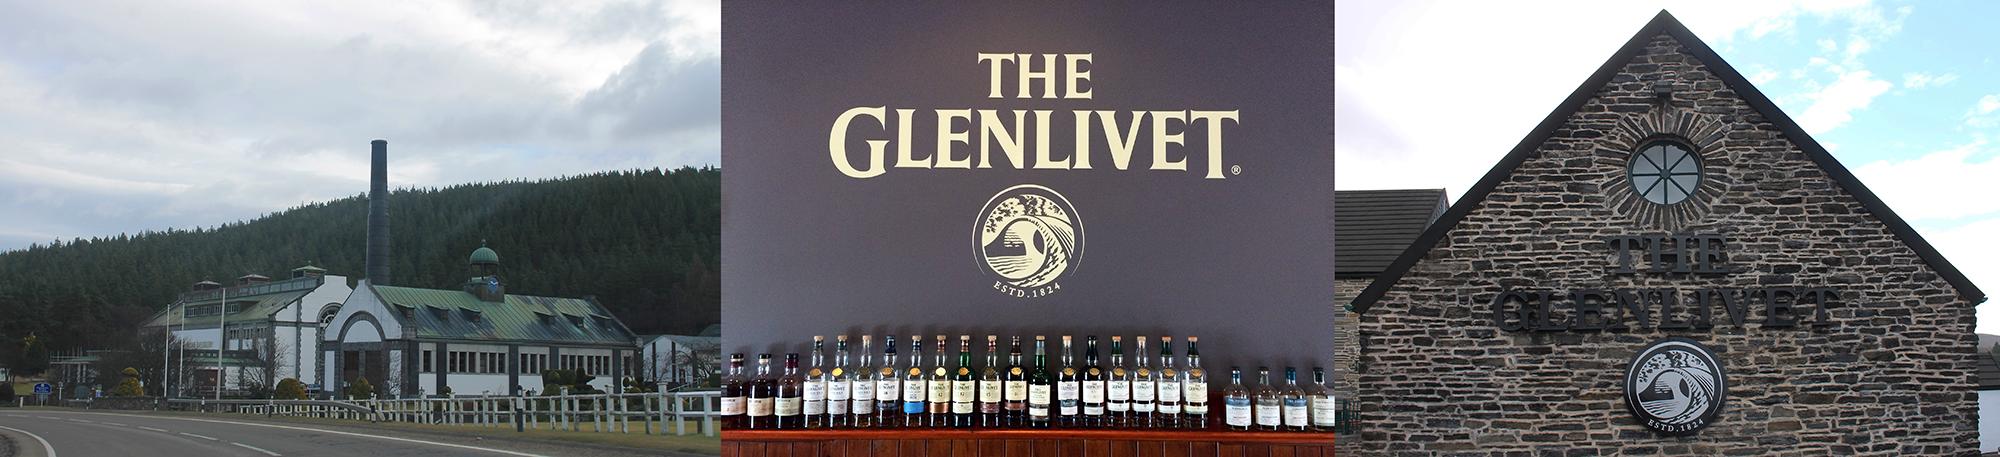 Scotland Glenlivet Distillery